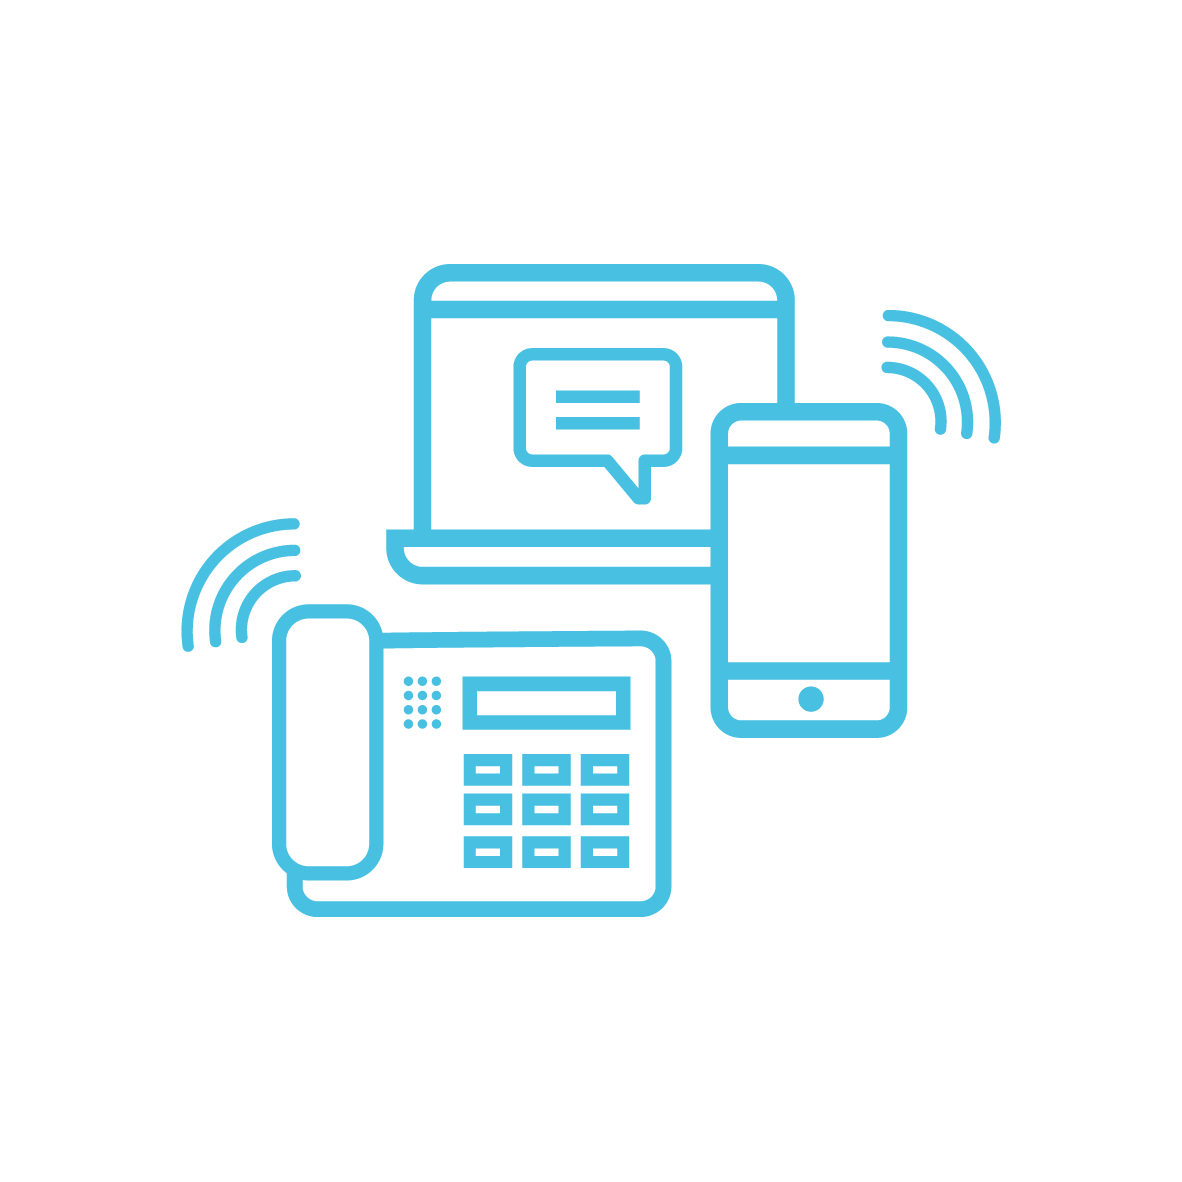 M297320-Communication-Solution-Icons-v2-LB-Unified-Communication2